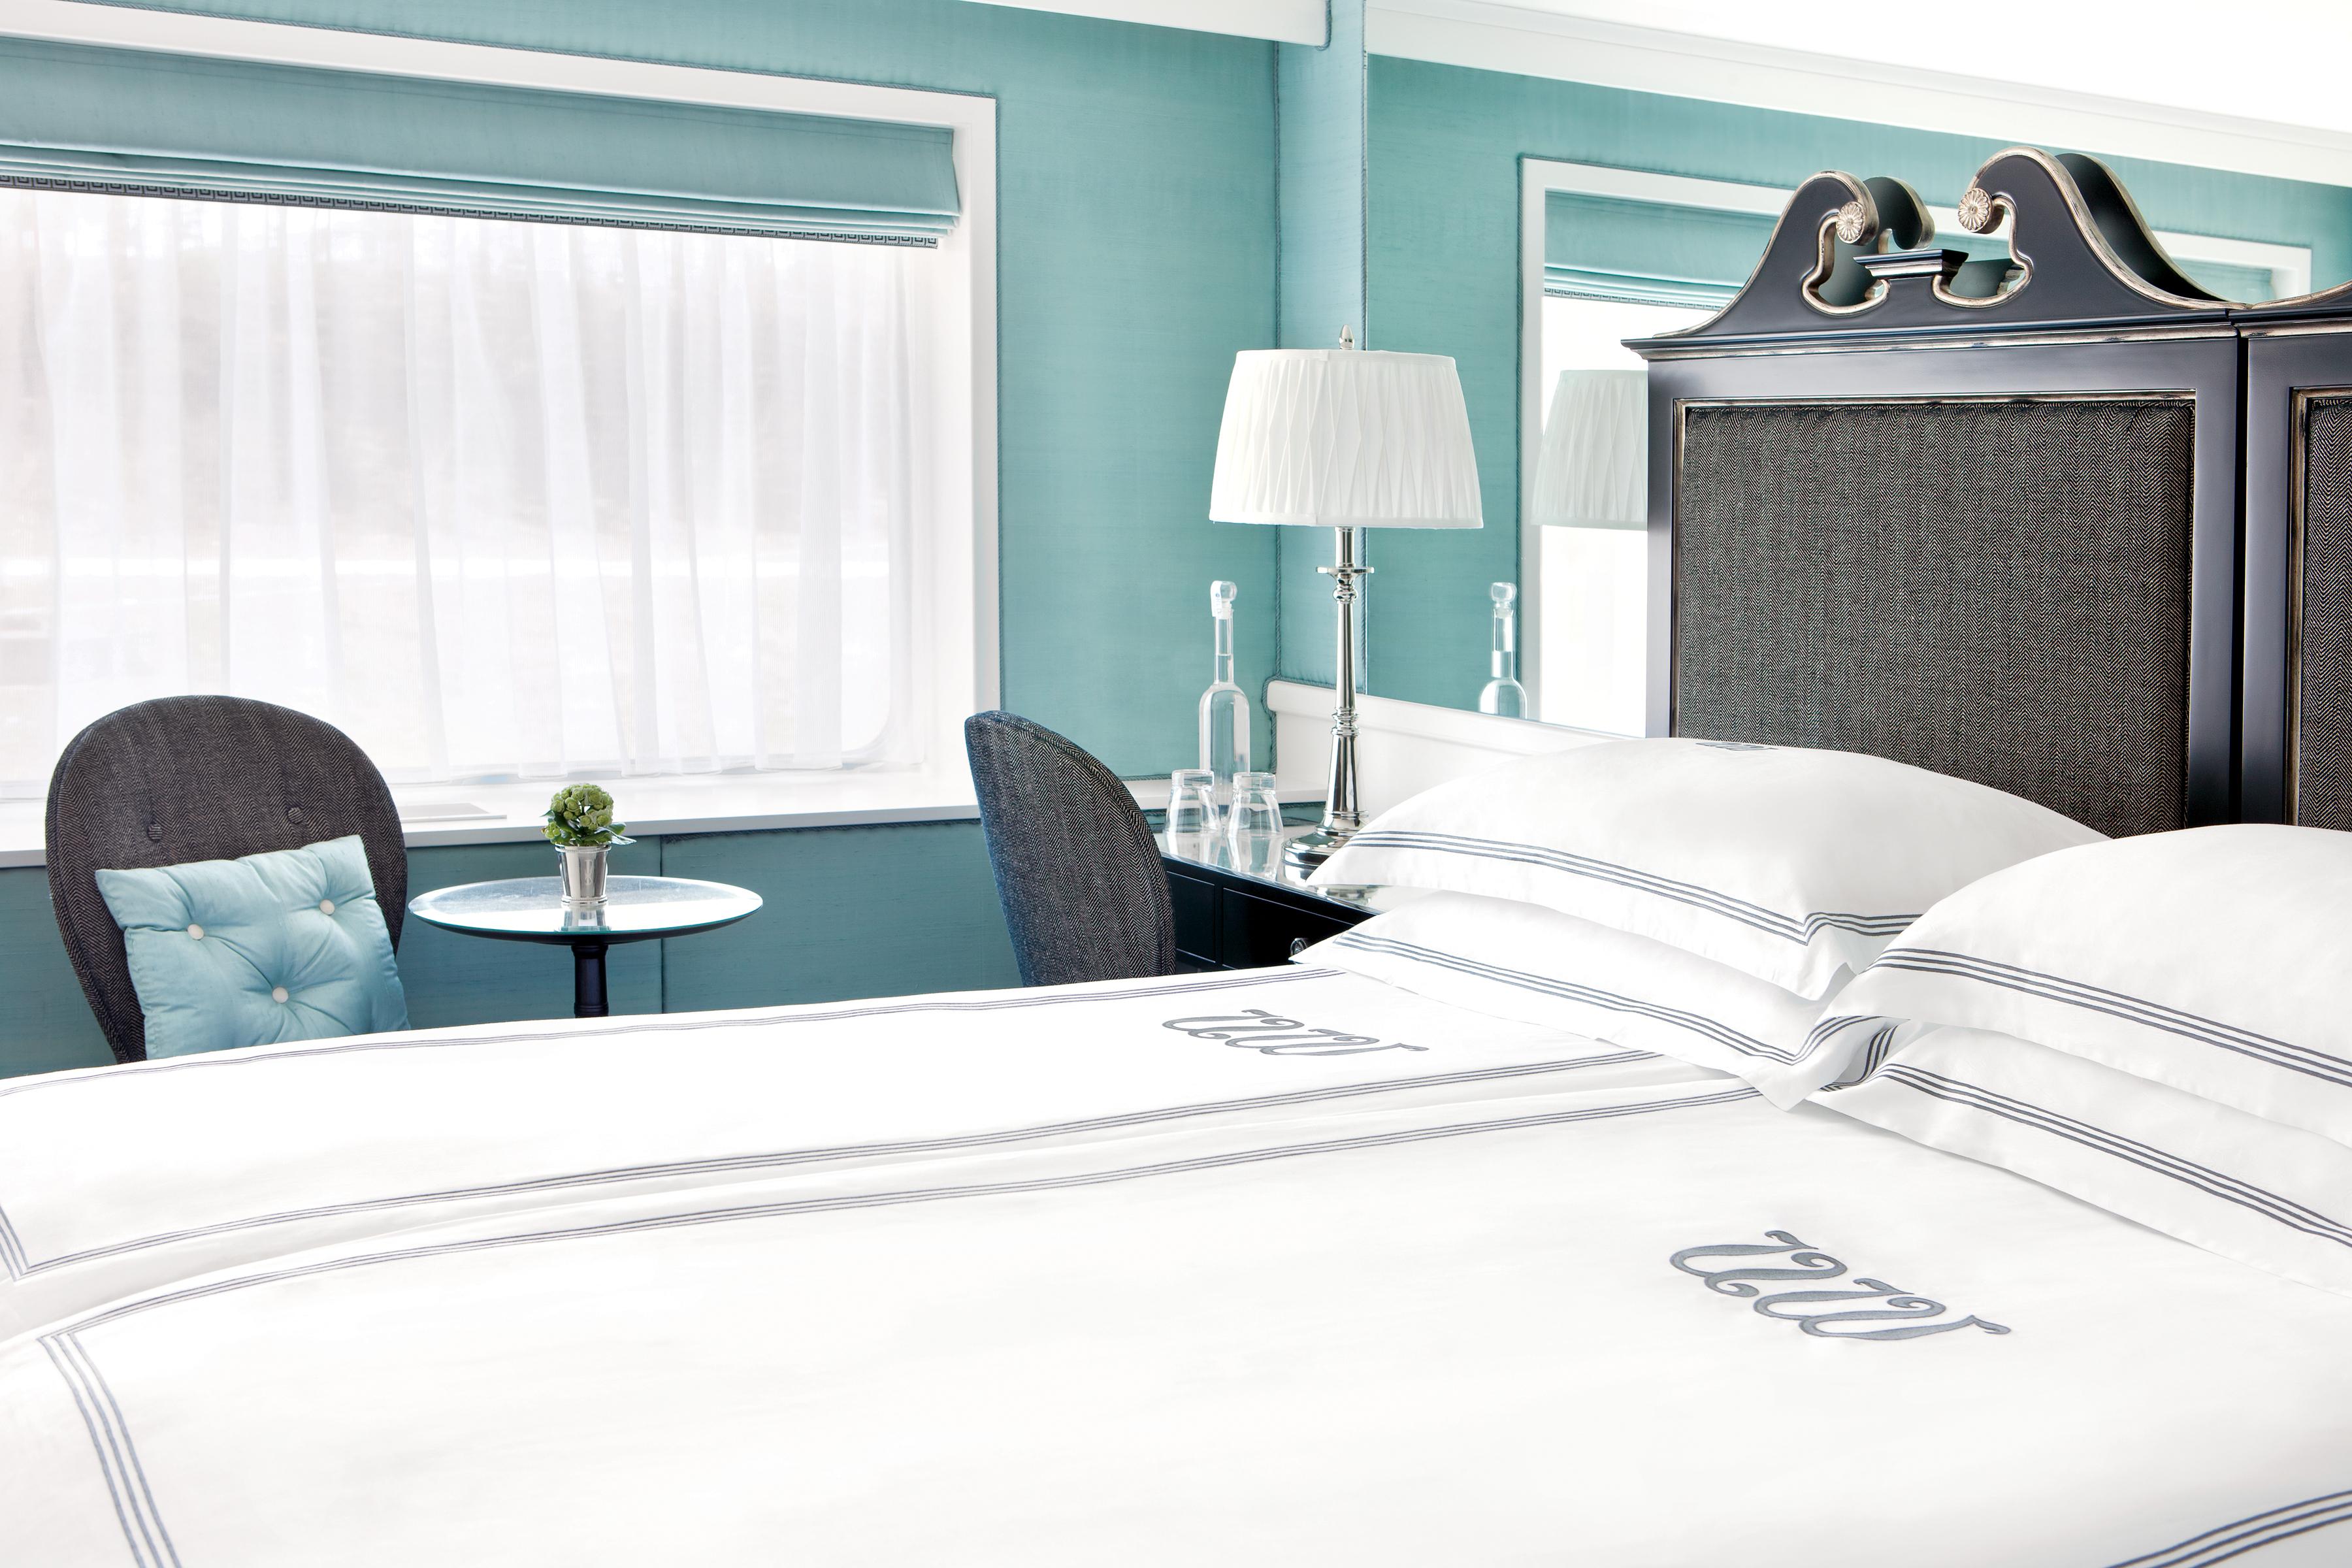 UNIWORLD Boutique River Cruises River Princess Accommodation Stateroom Category 2.jpg